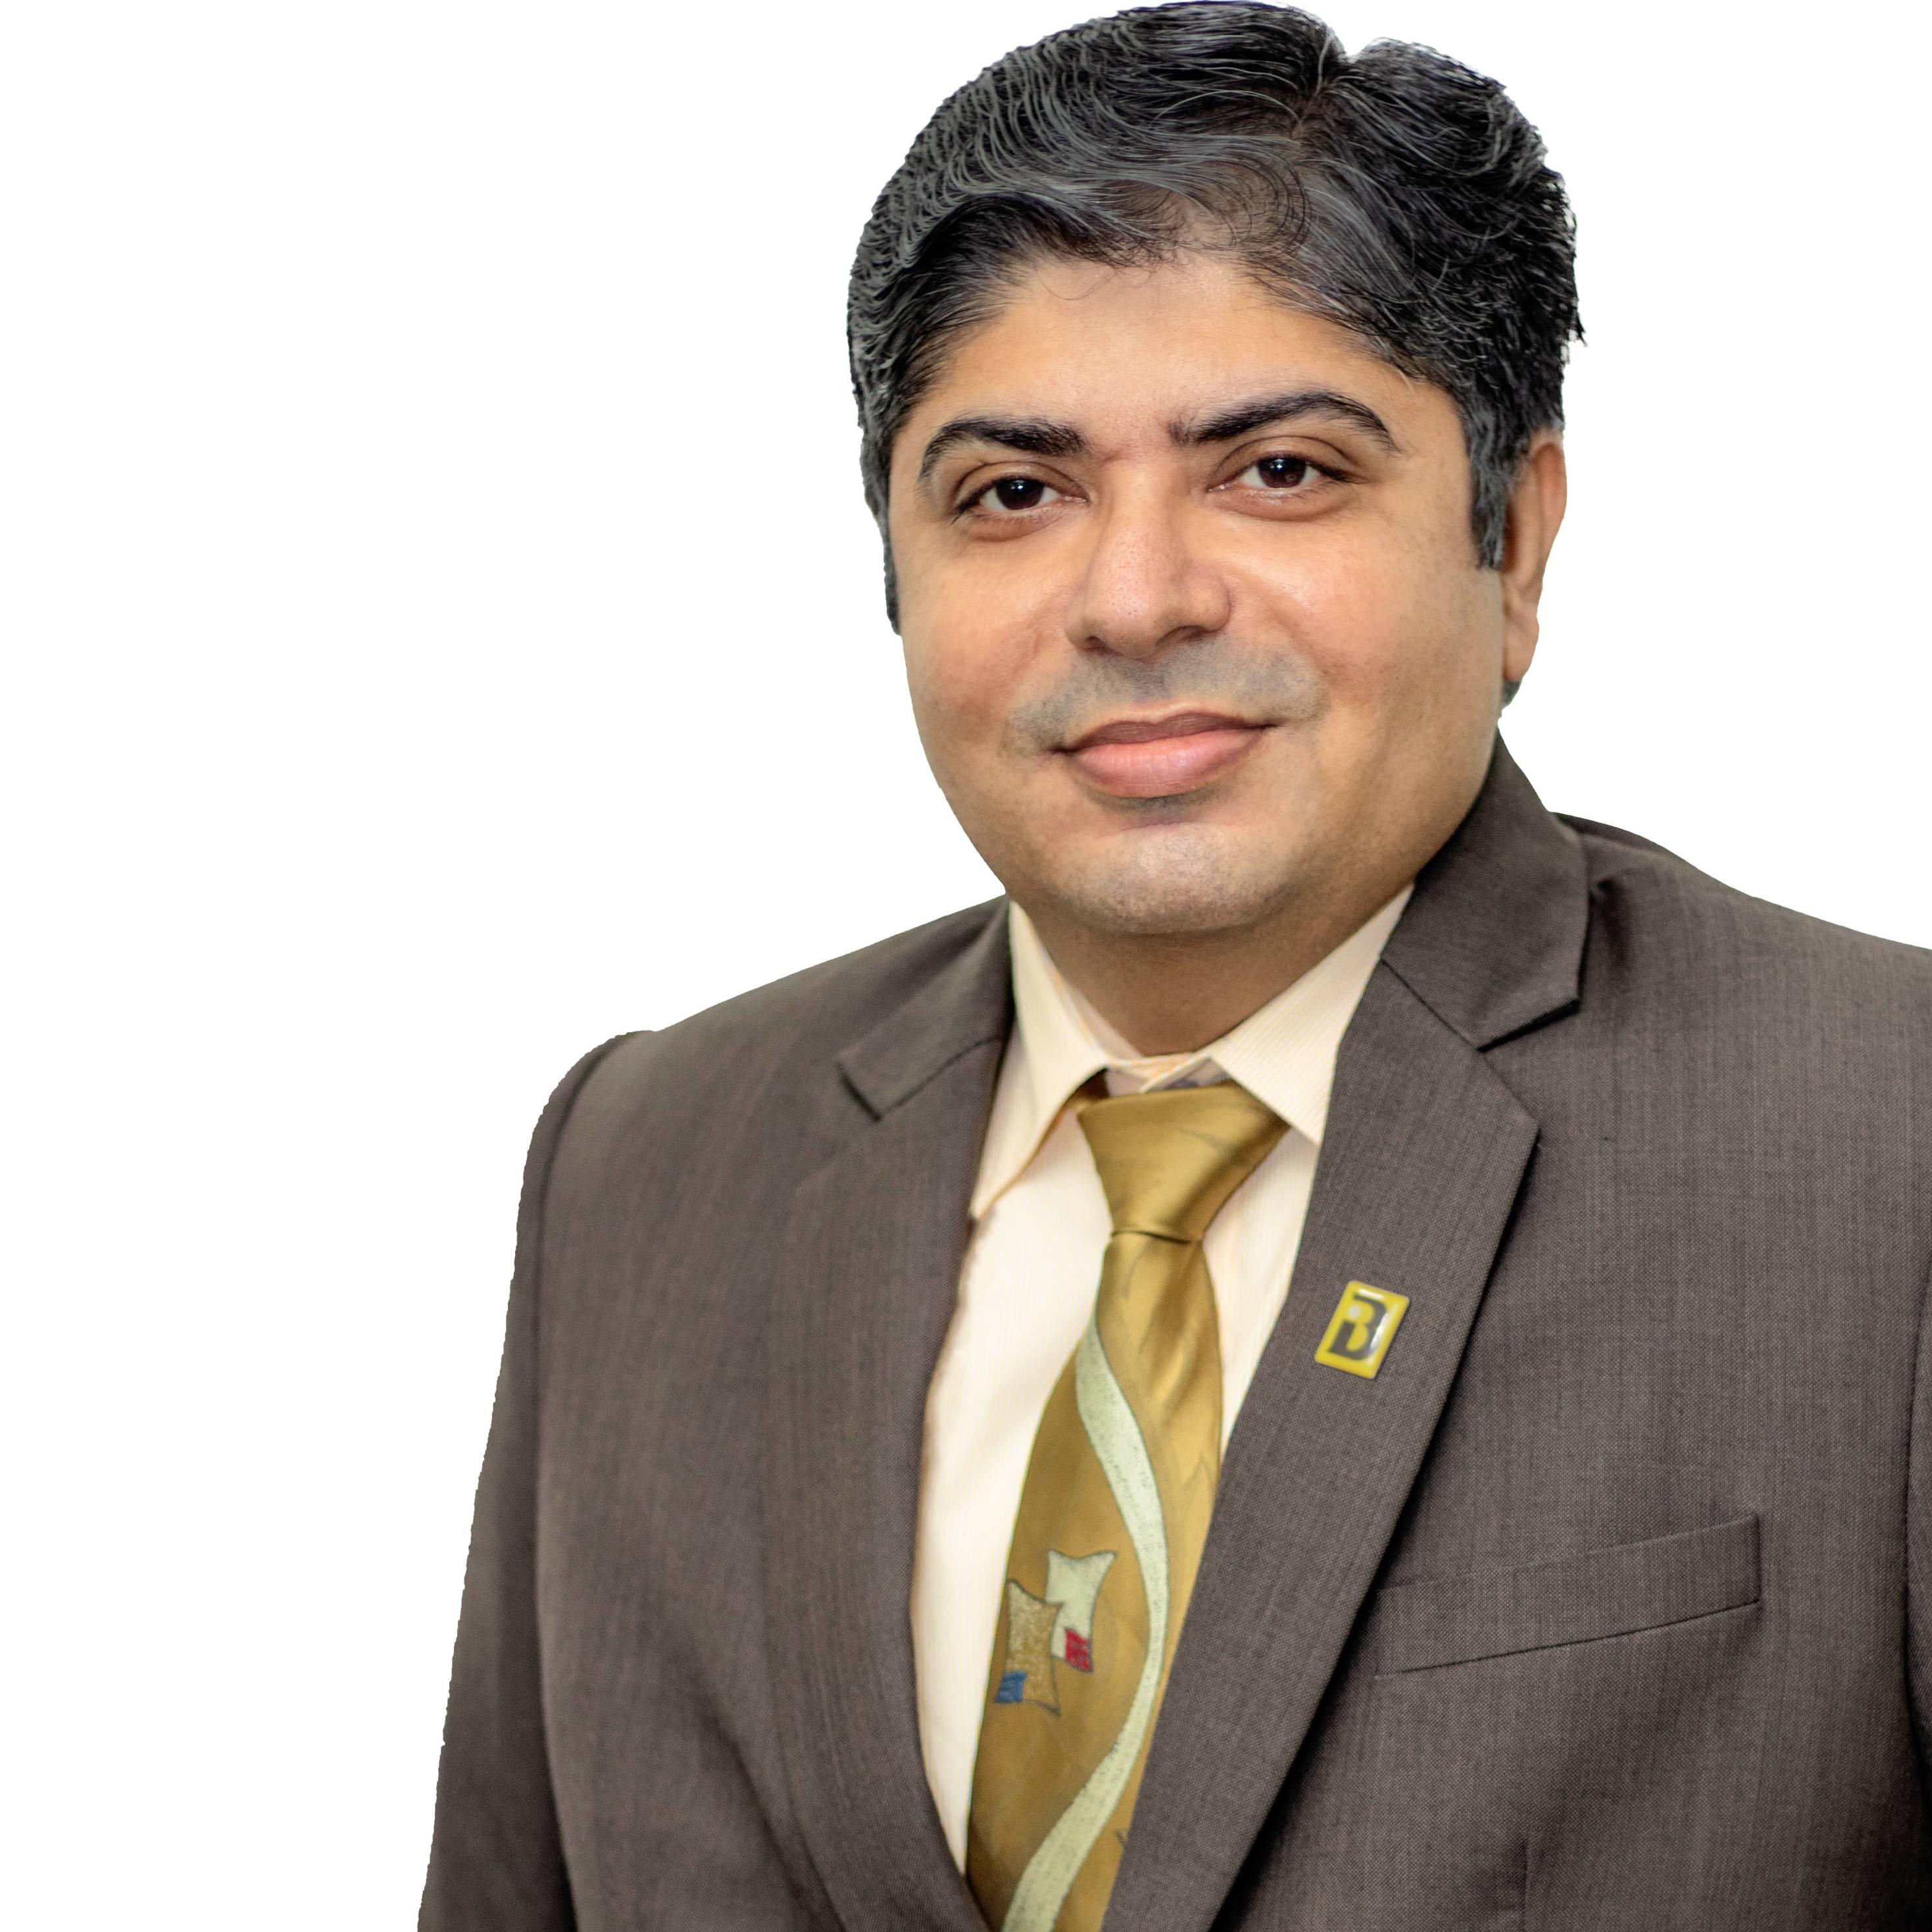 Sanjay Bulchandani